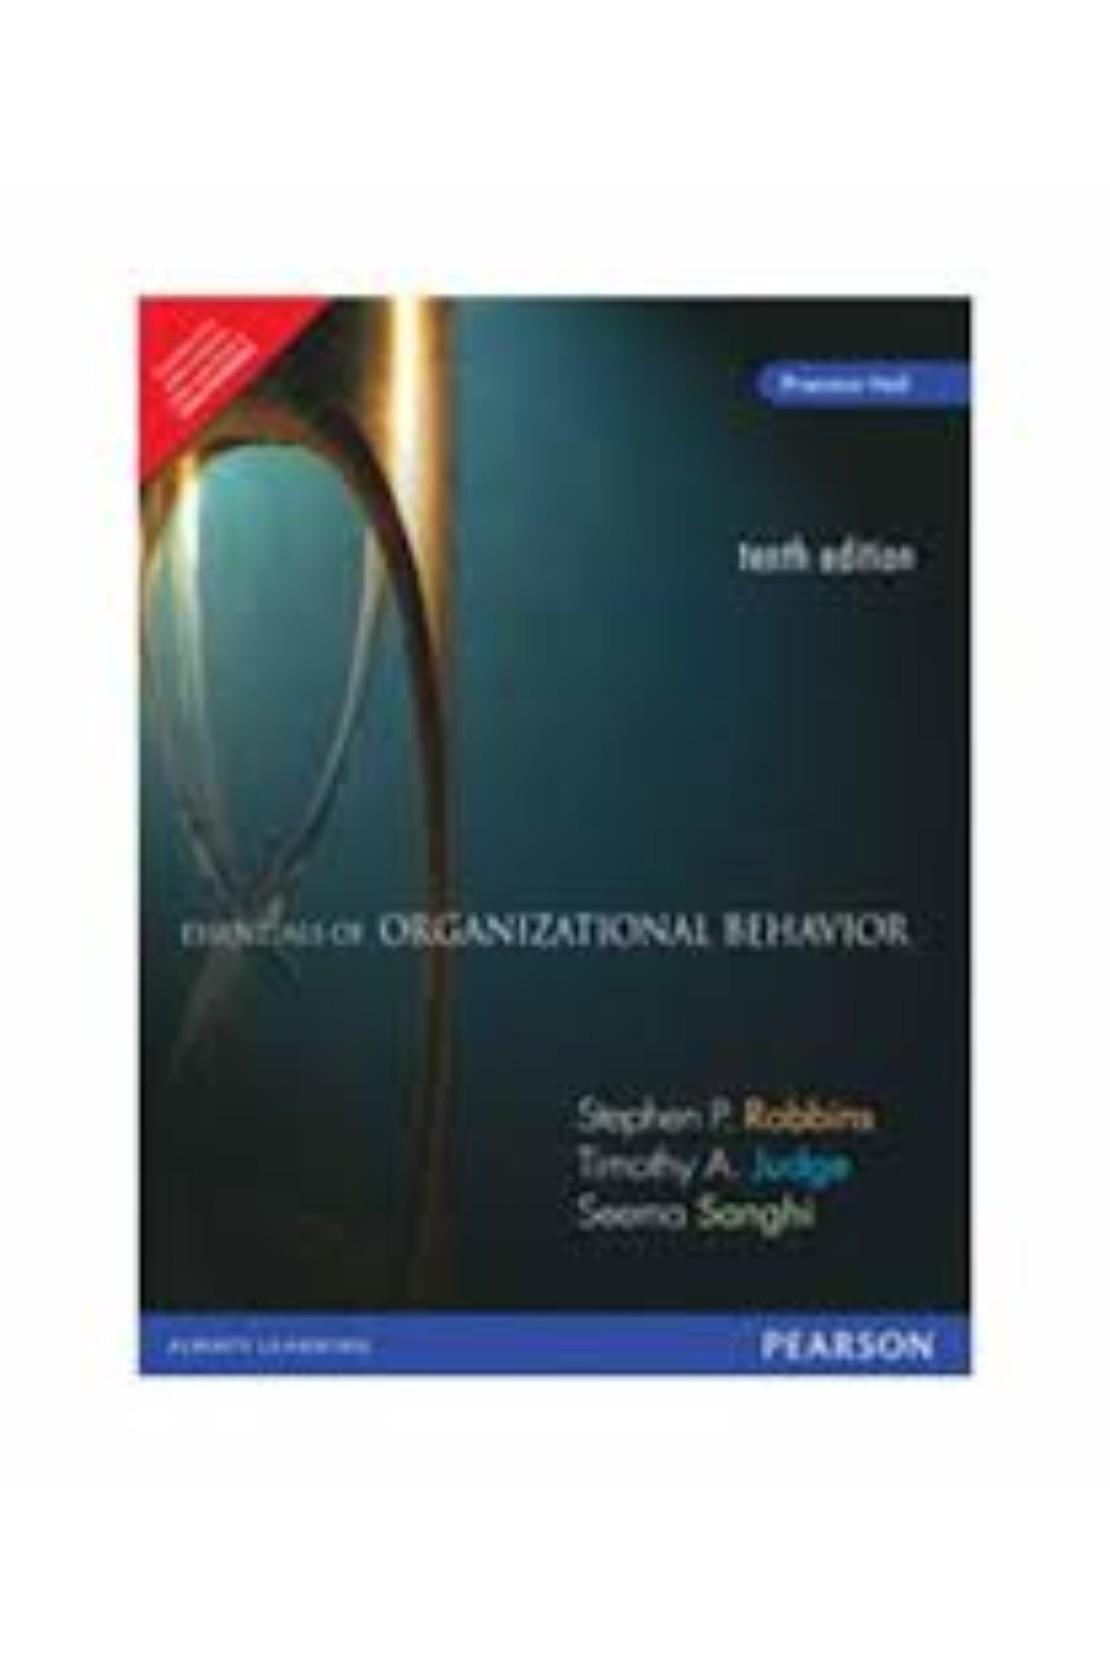 ESSENTIALS OF ORGANIZATIONAL BEHAVIOR 10/E (PB)